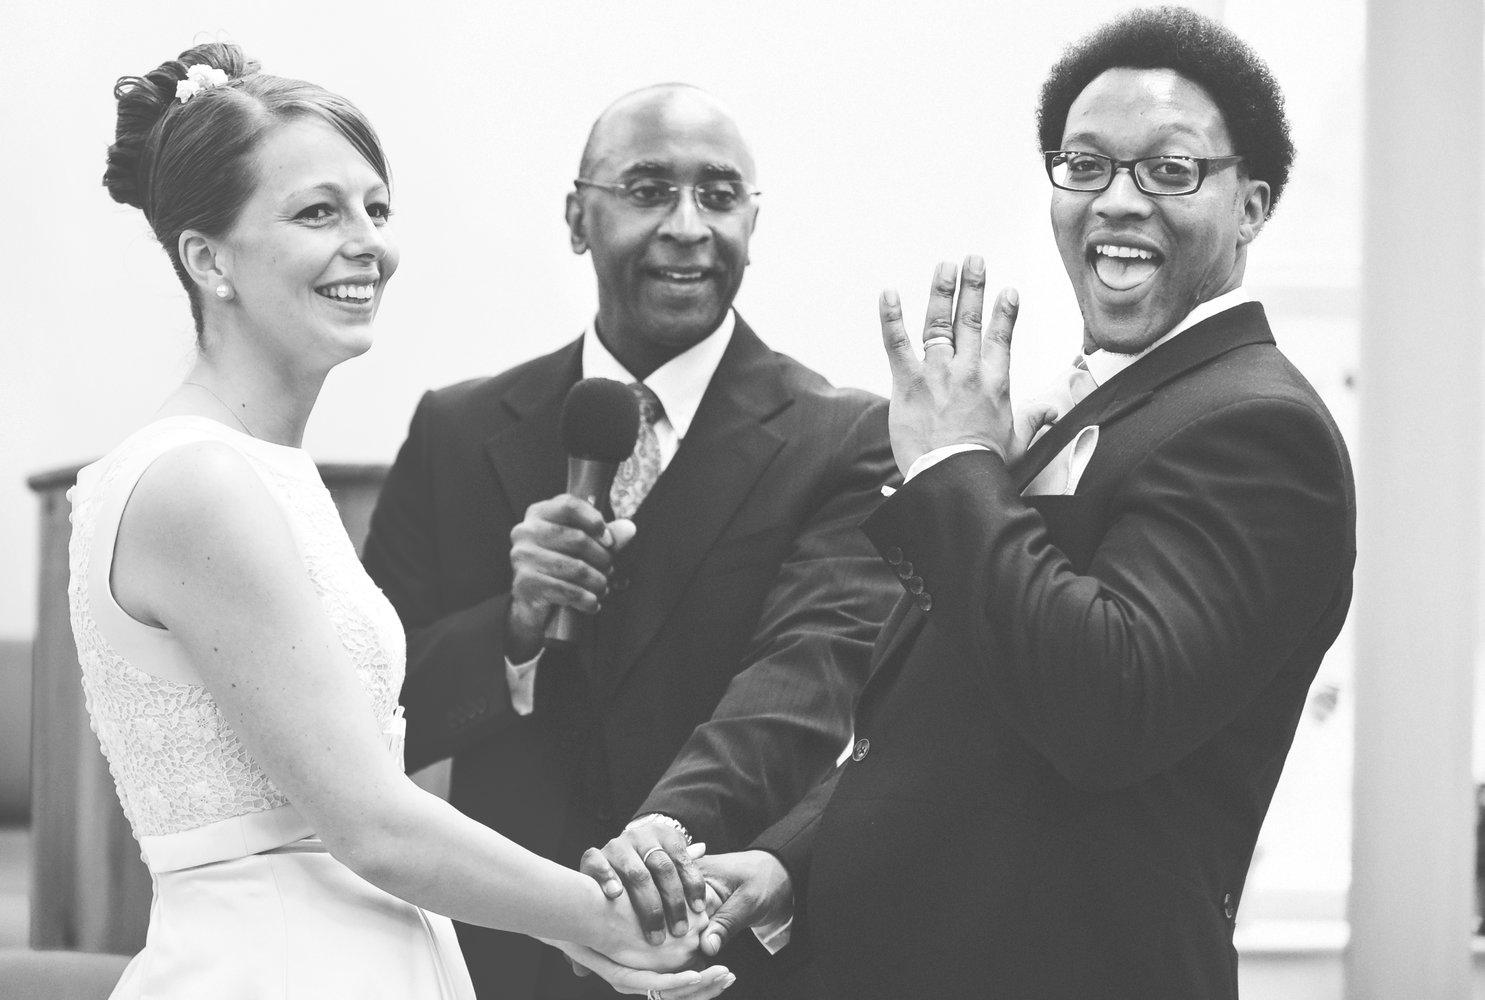 Leeds Wedding Photographer West Yorkshire Wedding Photography